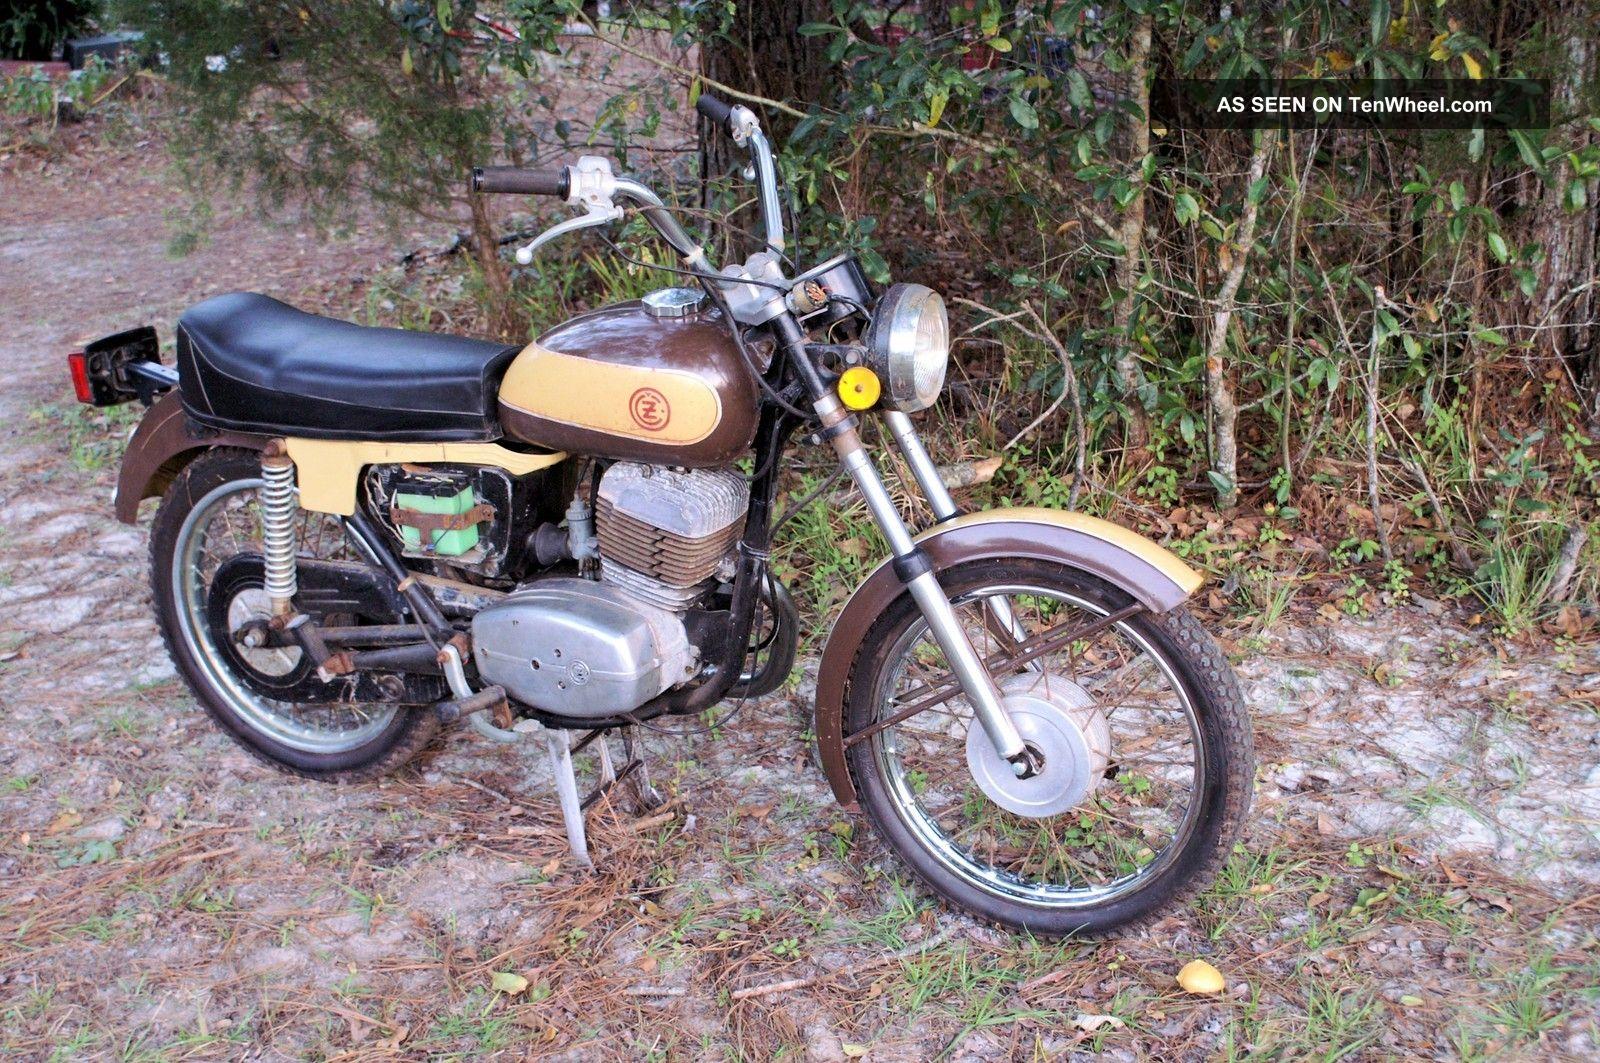 1974 Cz 175 Street Bike Other Makes photo